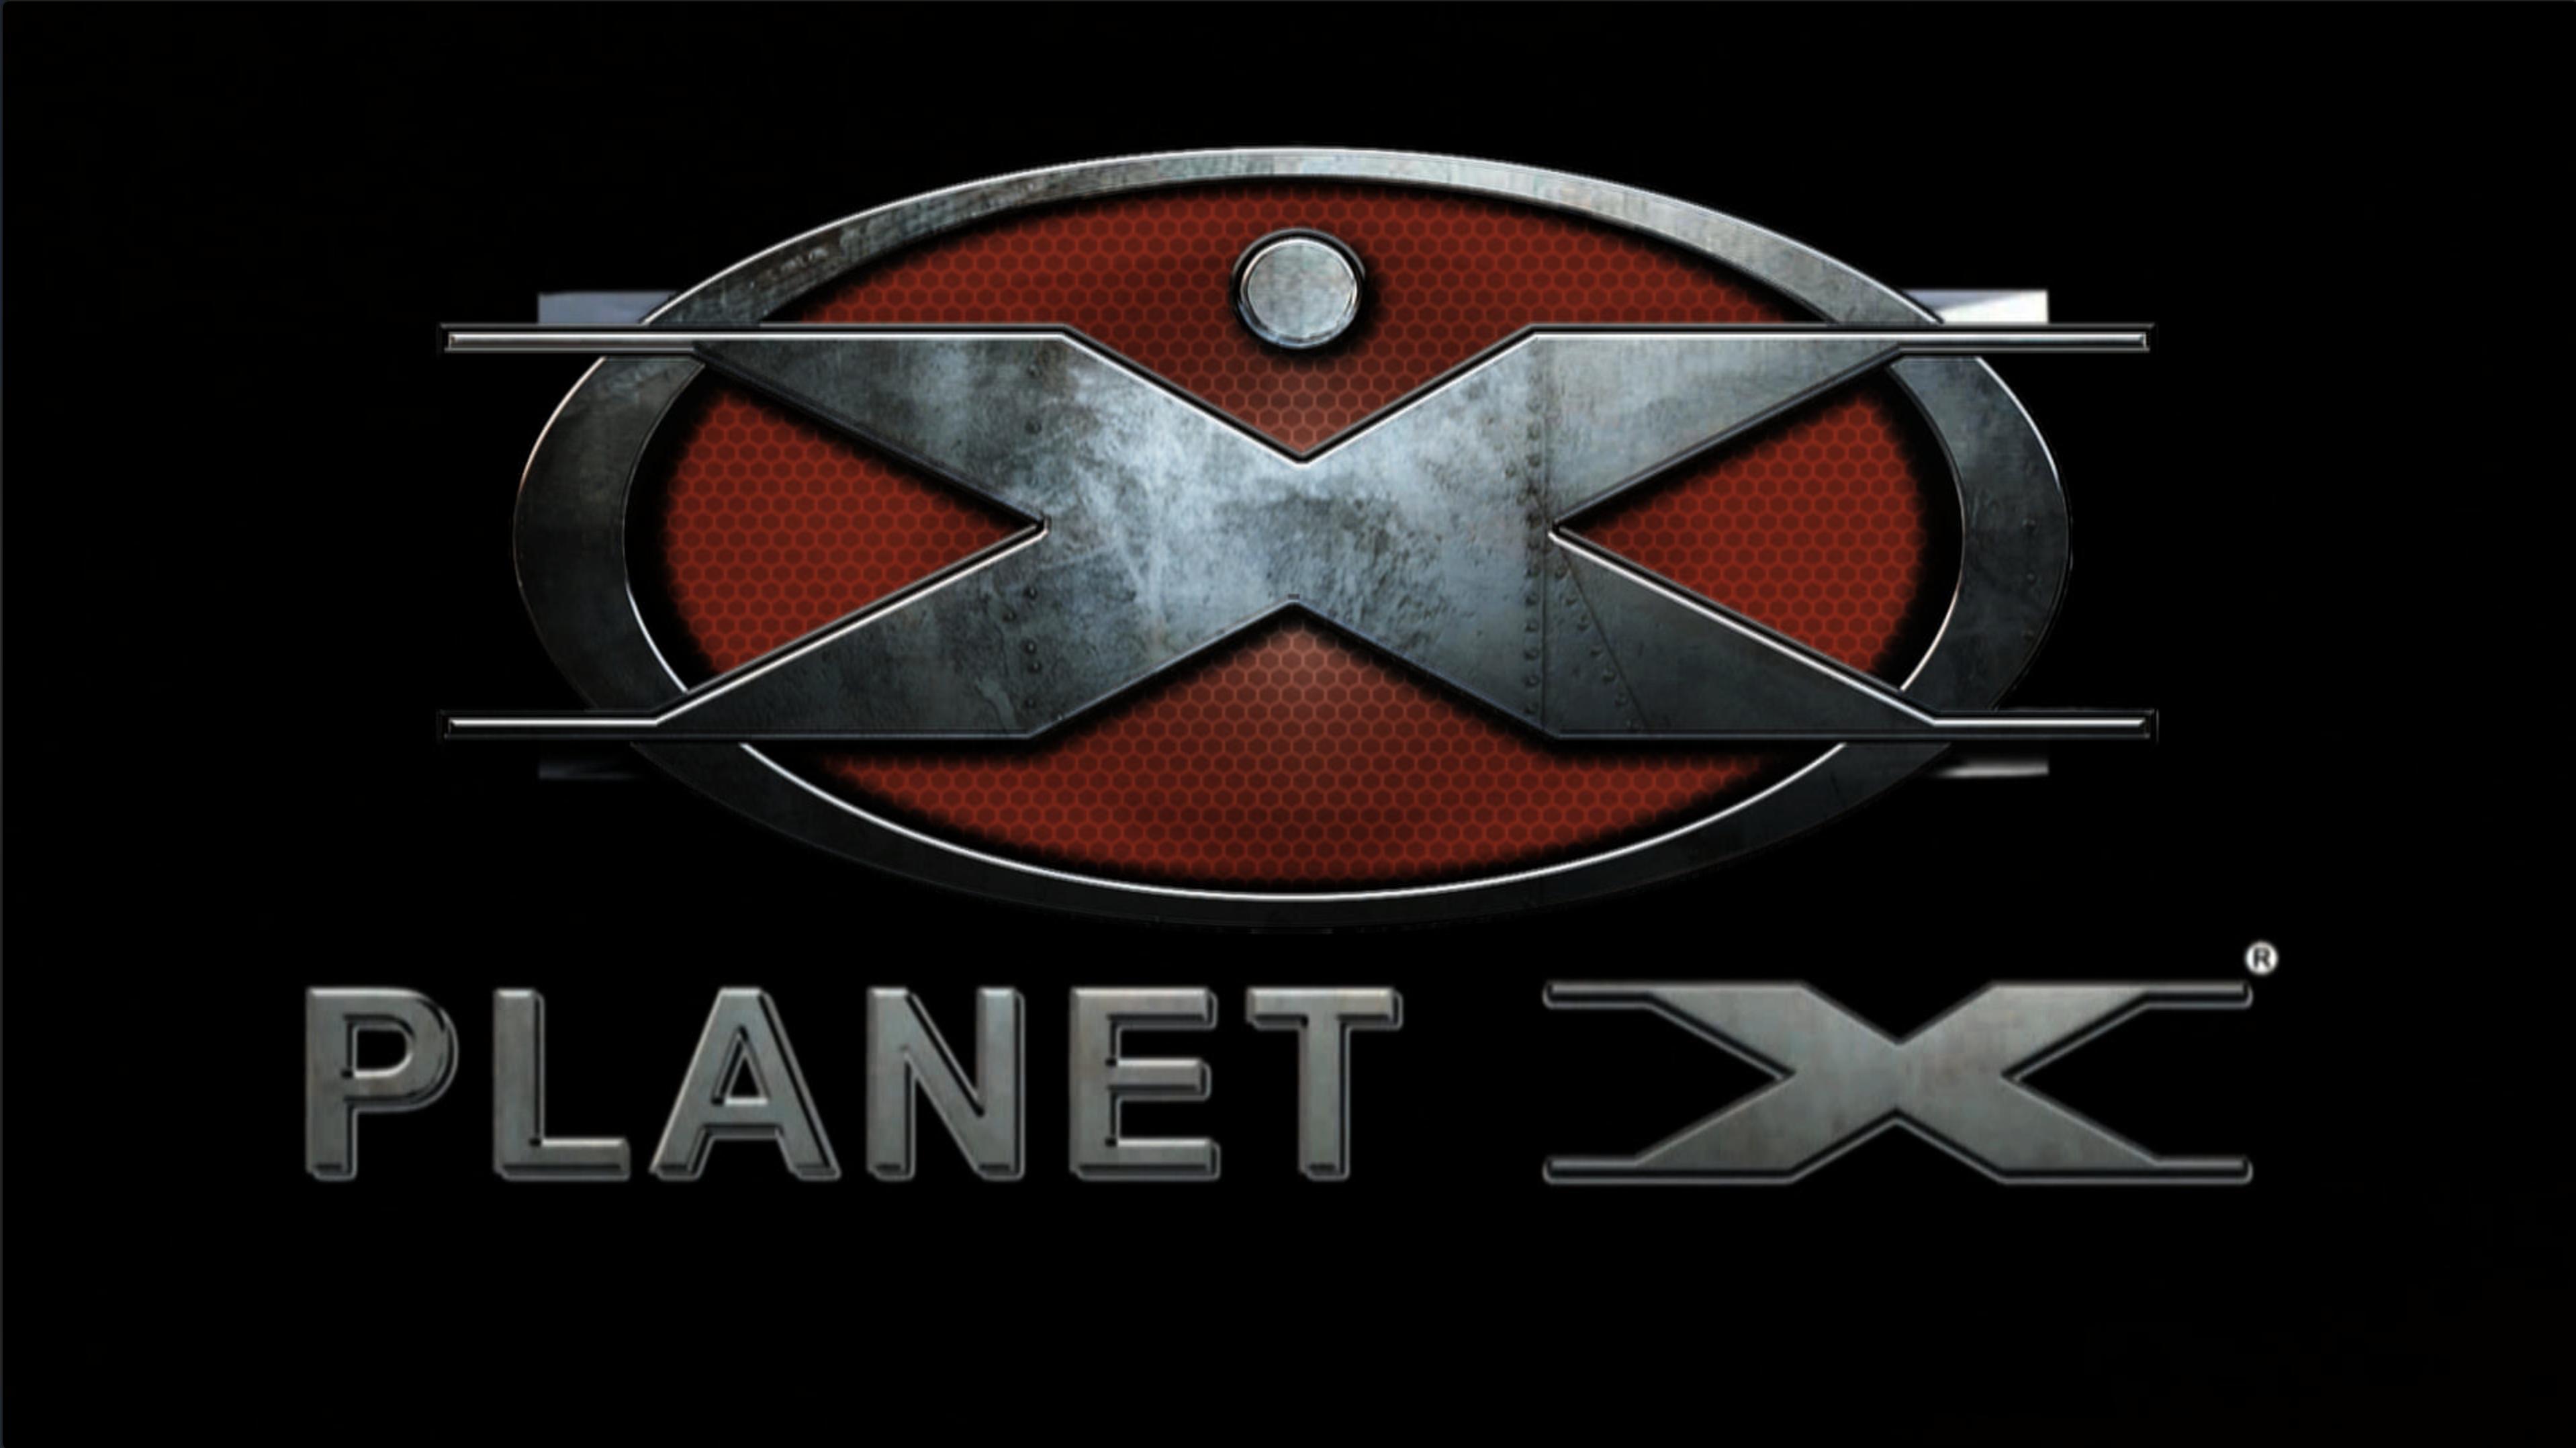 PLANET X 1